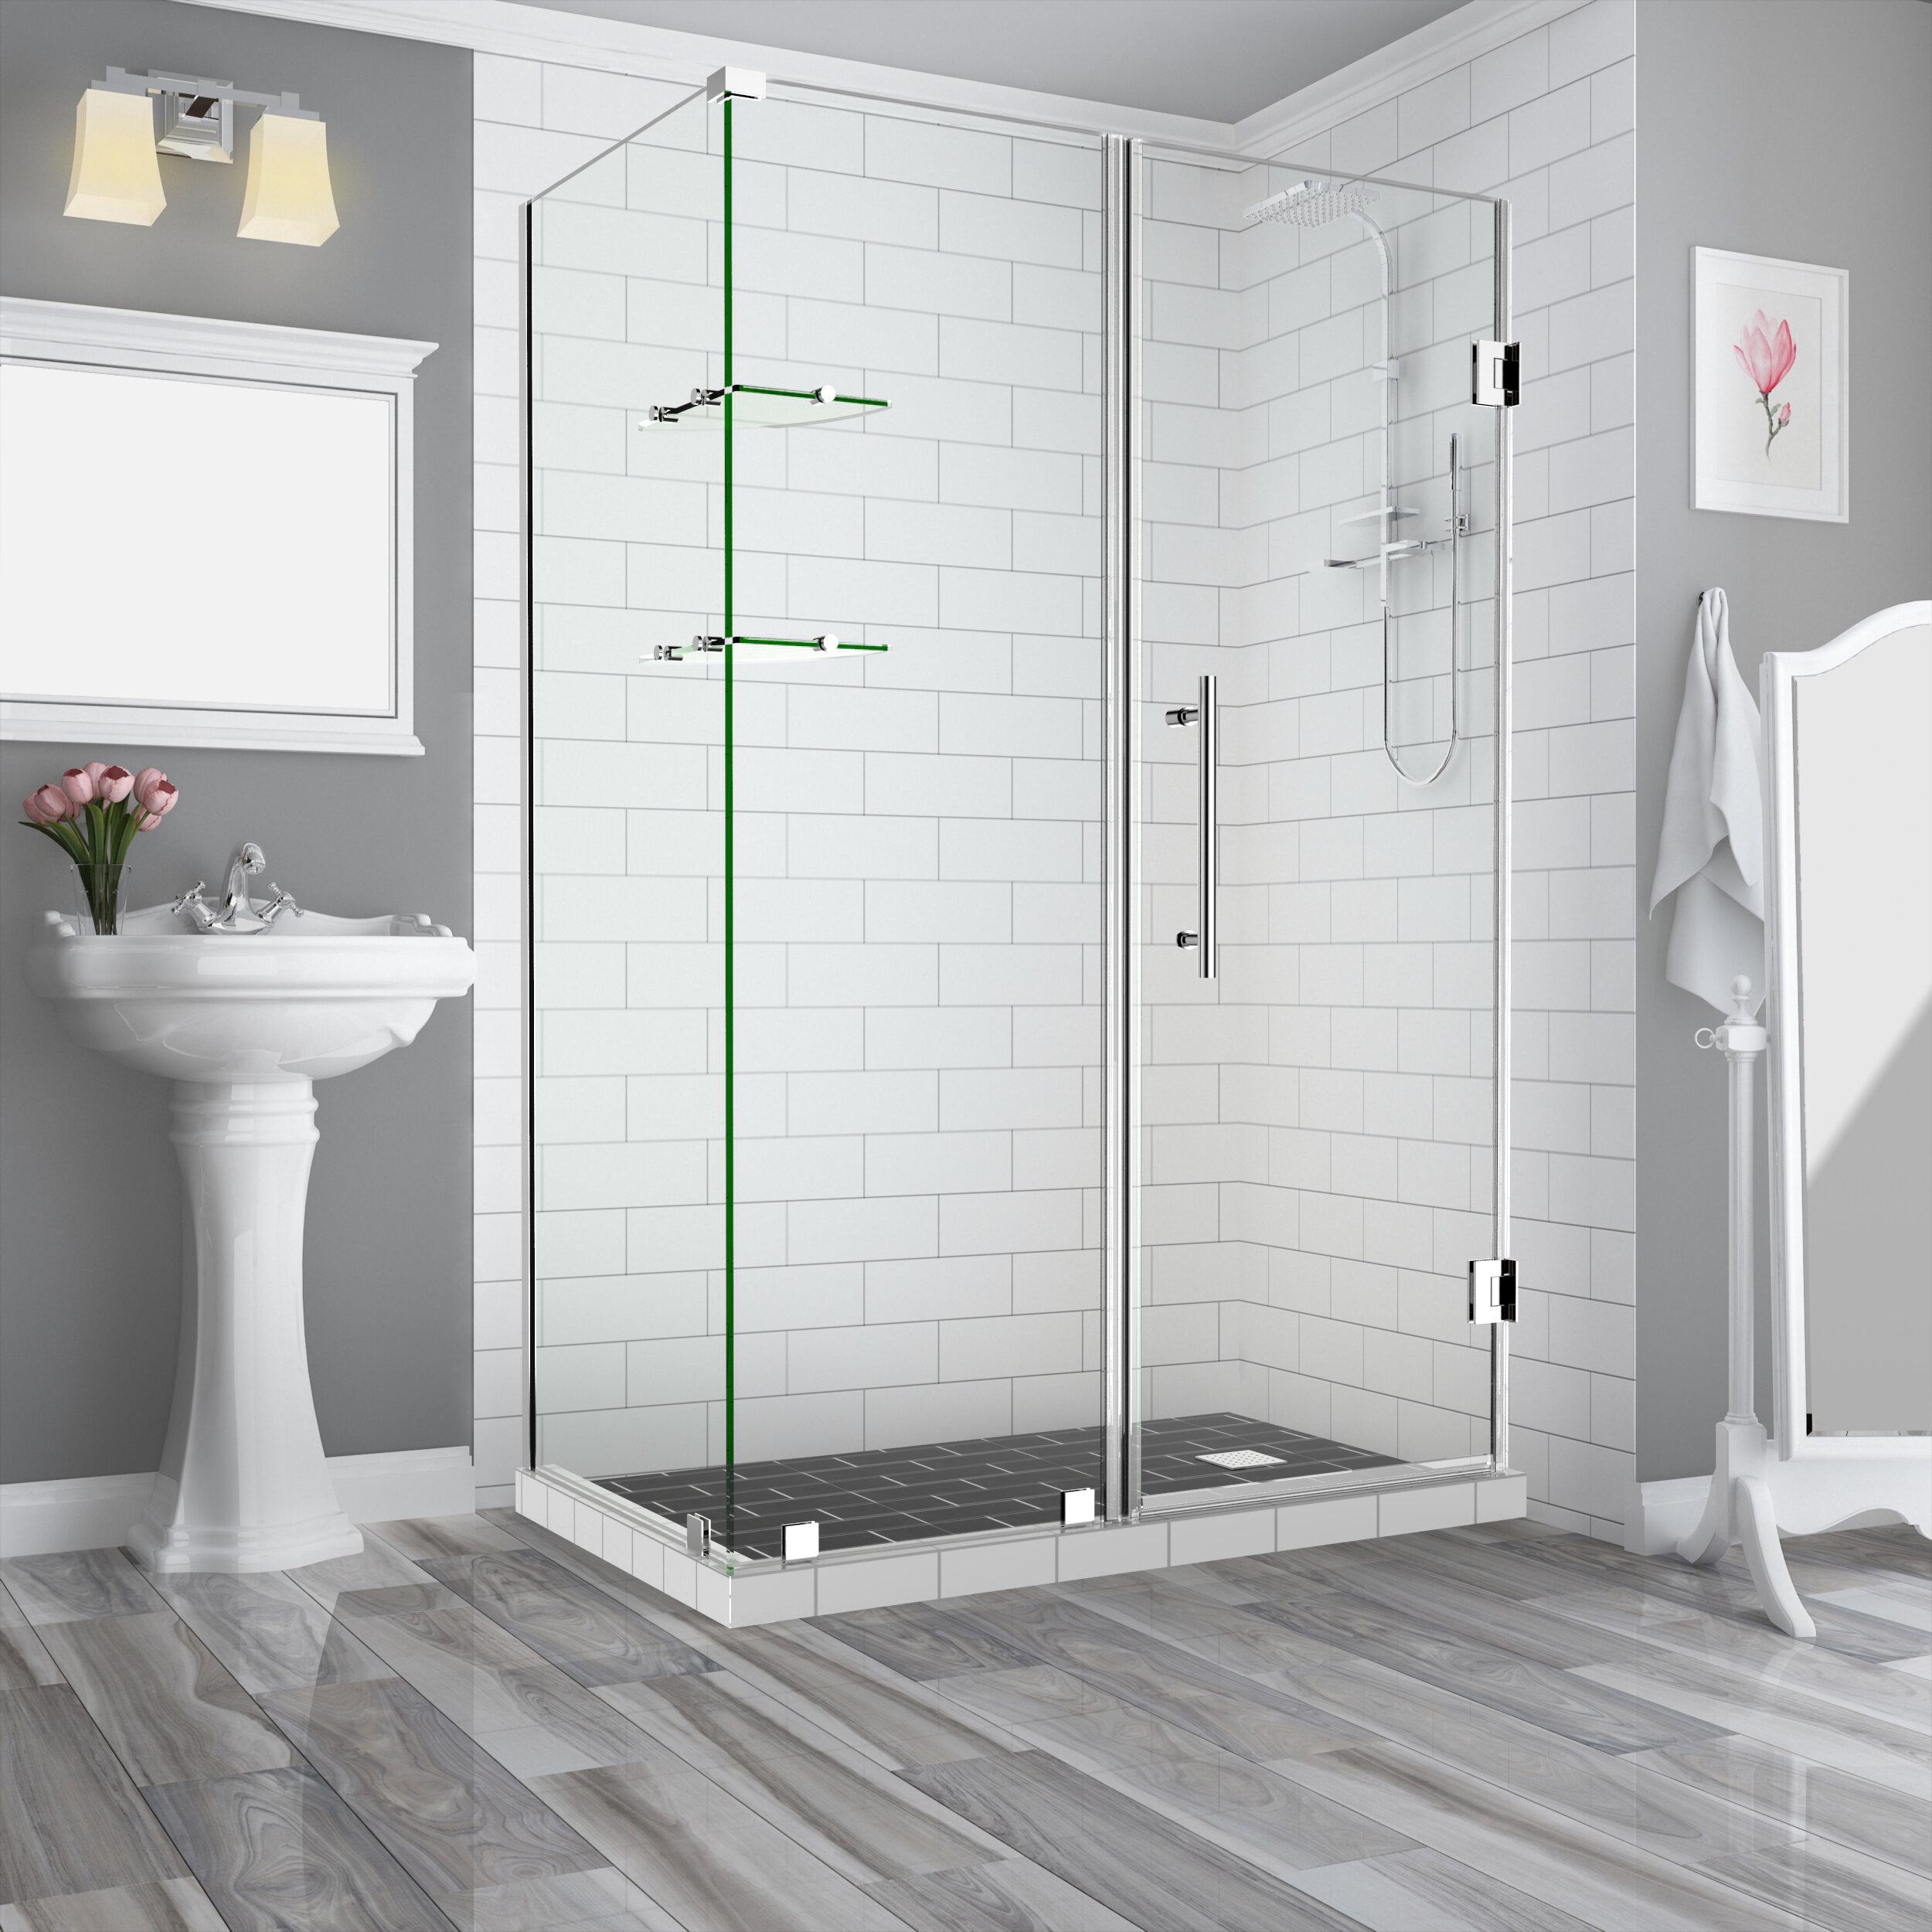 Bromley Gs 55 X 72 Hinged Semi Frameless Shower Door